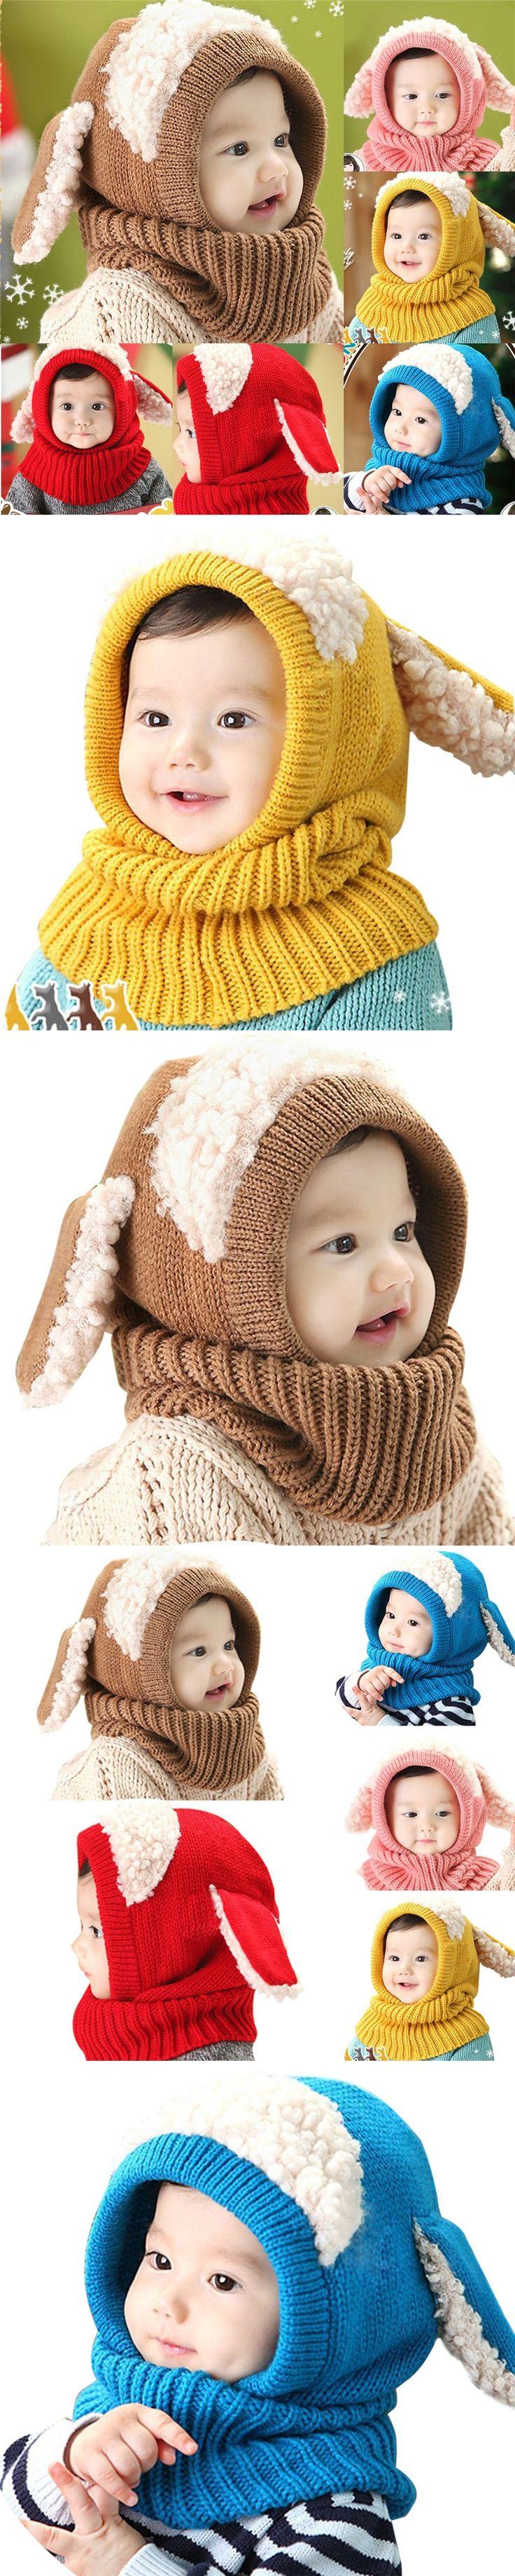 Winter Baby Hat 2017 Hats For Girls Kids Children Rabbit Long Ear Cap Soft Crochet Baby Caps Hooded Hat Scarf Set Bonnet